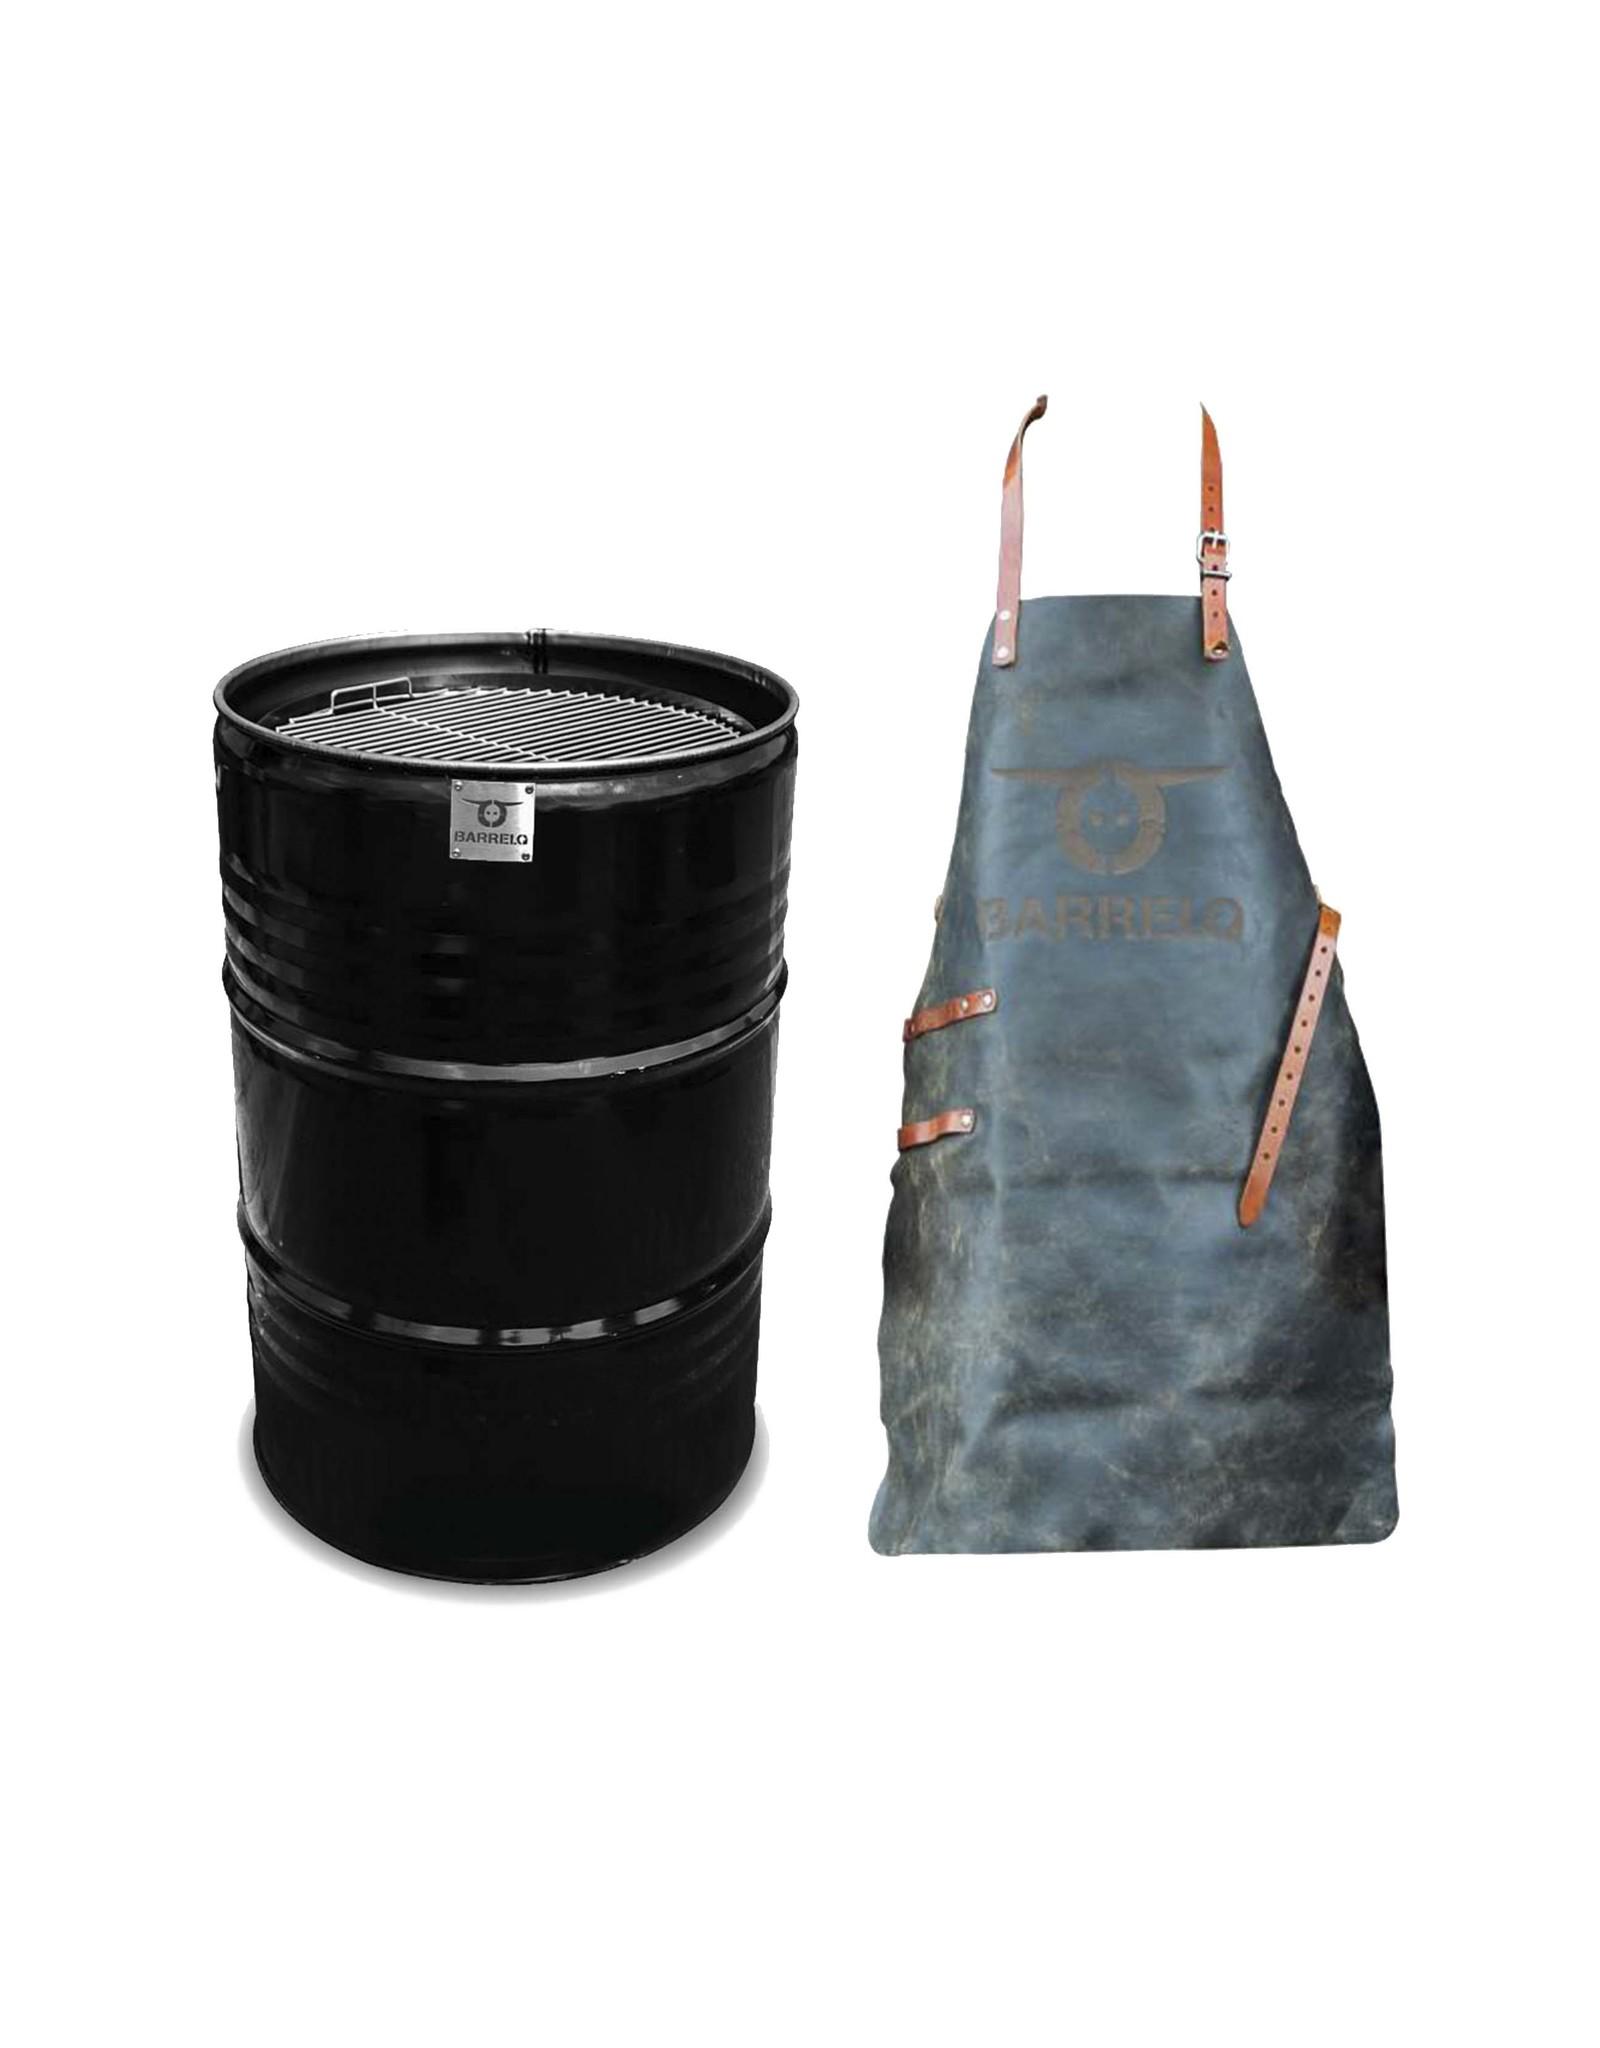 BarrelQ Grill Big Original plus Grillschürze